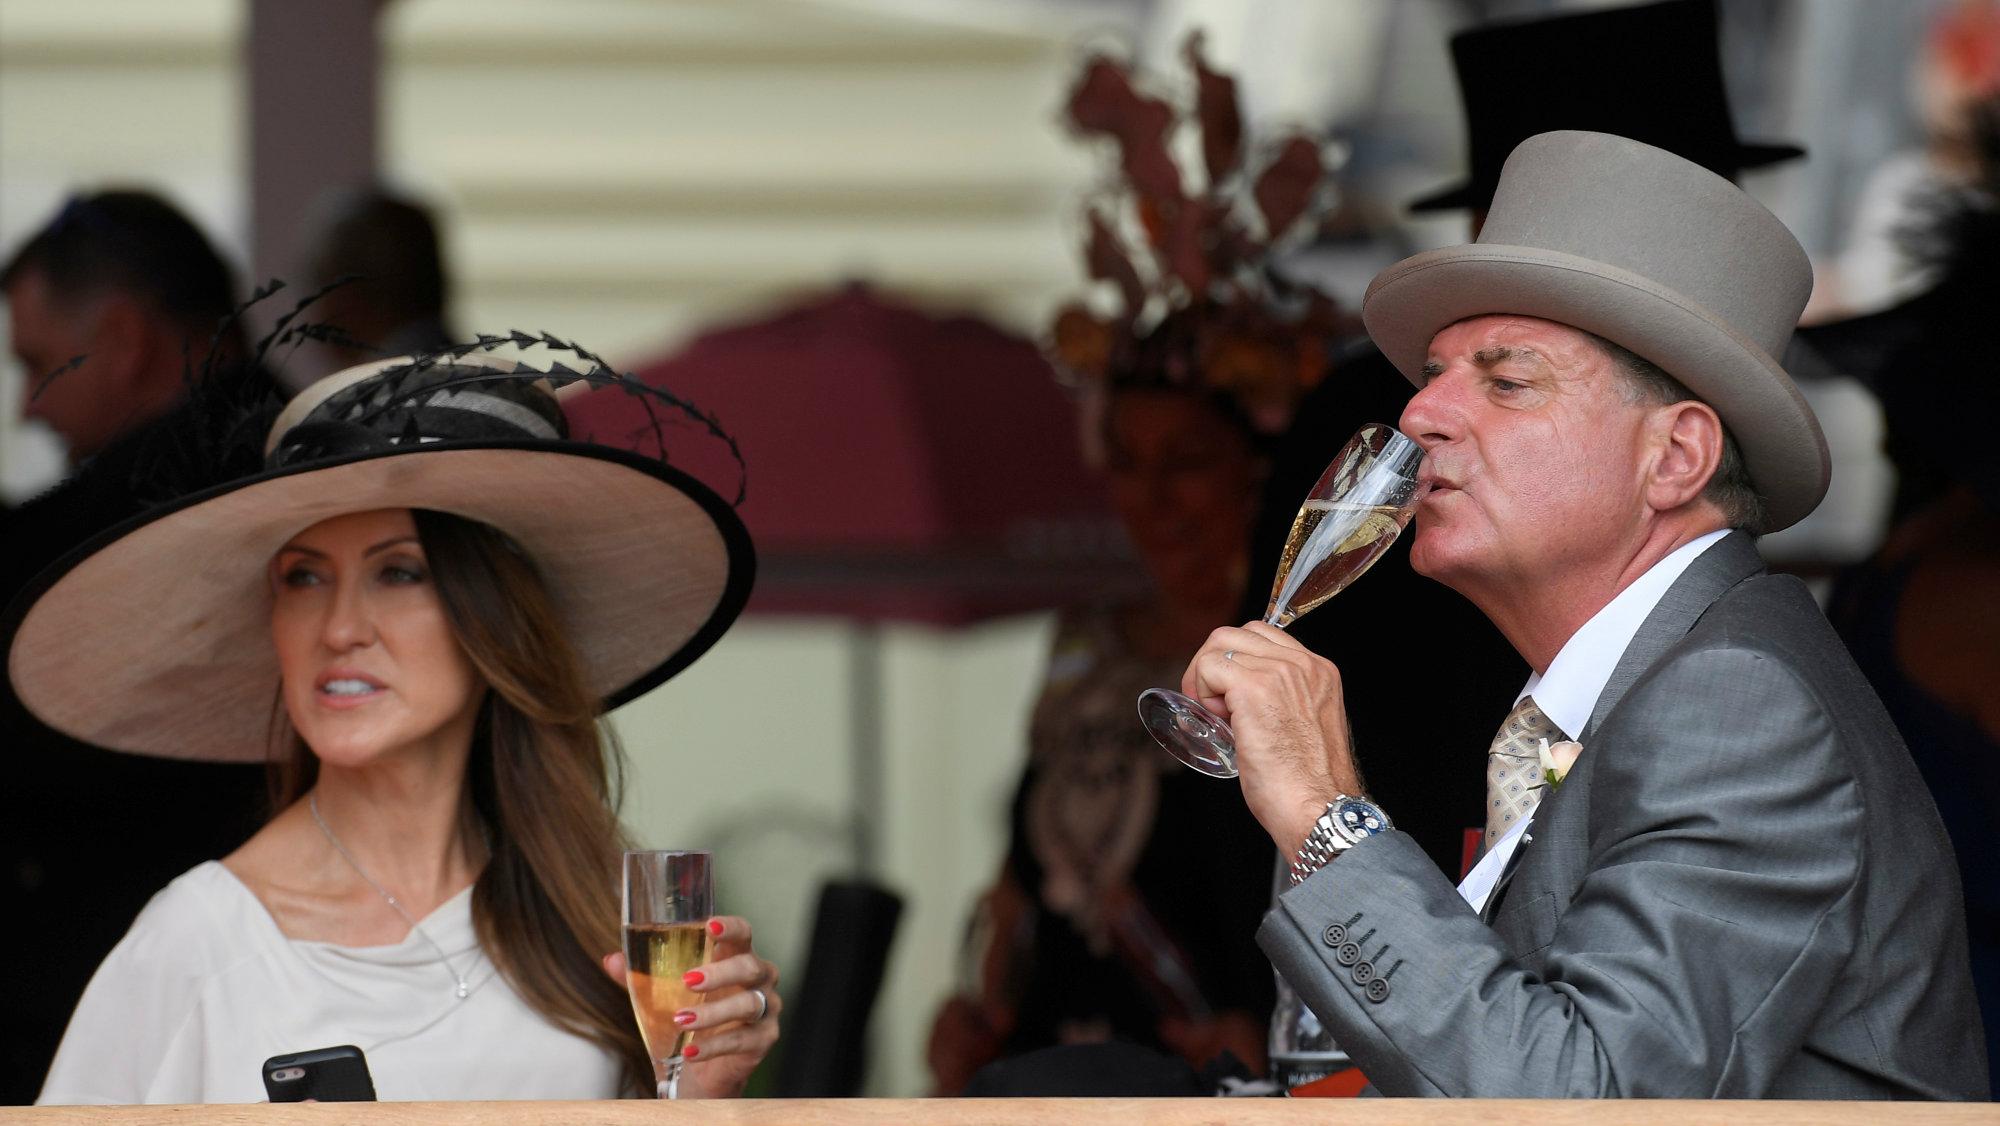 Wine drinkers in Britain